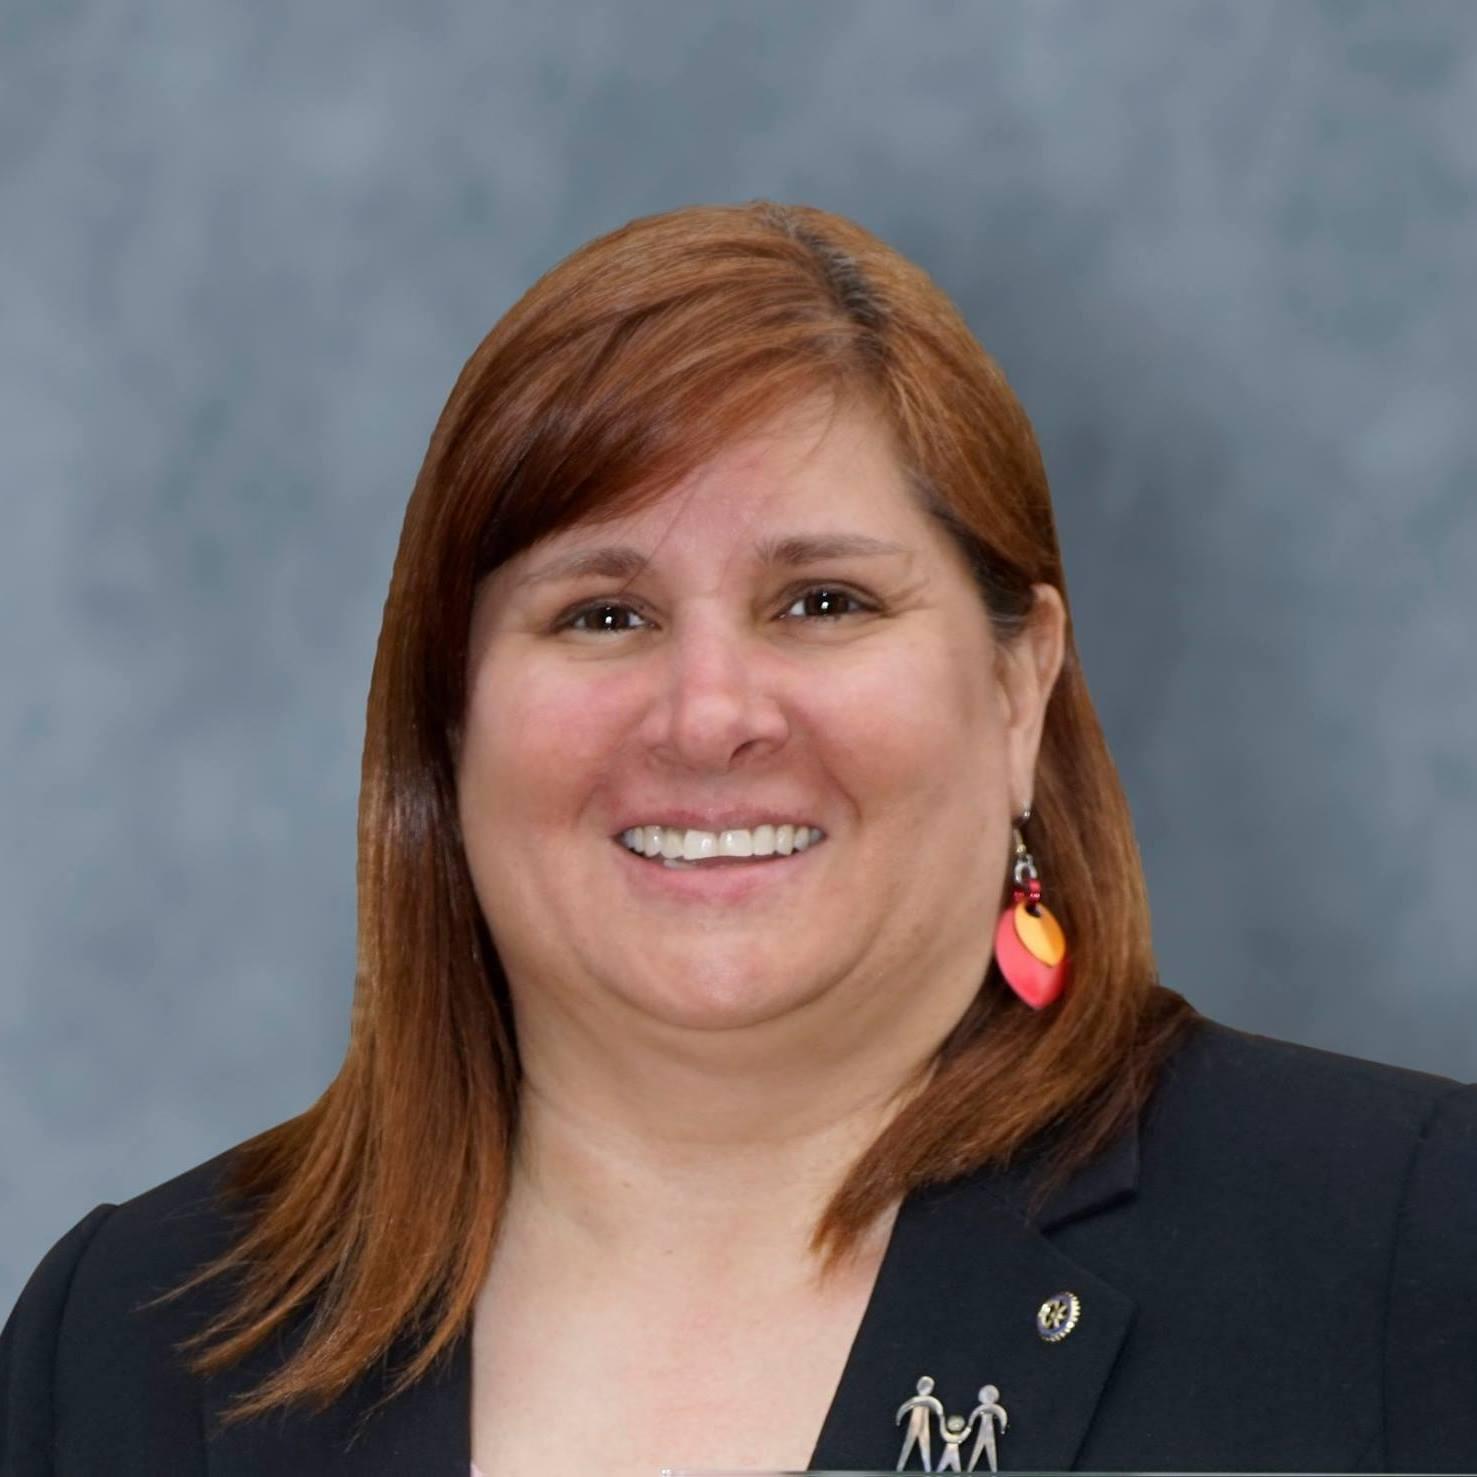 Trish Glees-Dundee Township Supervisor